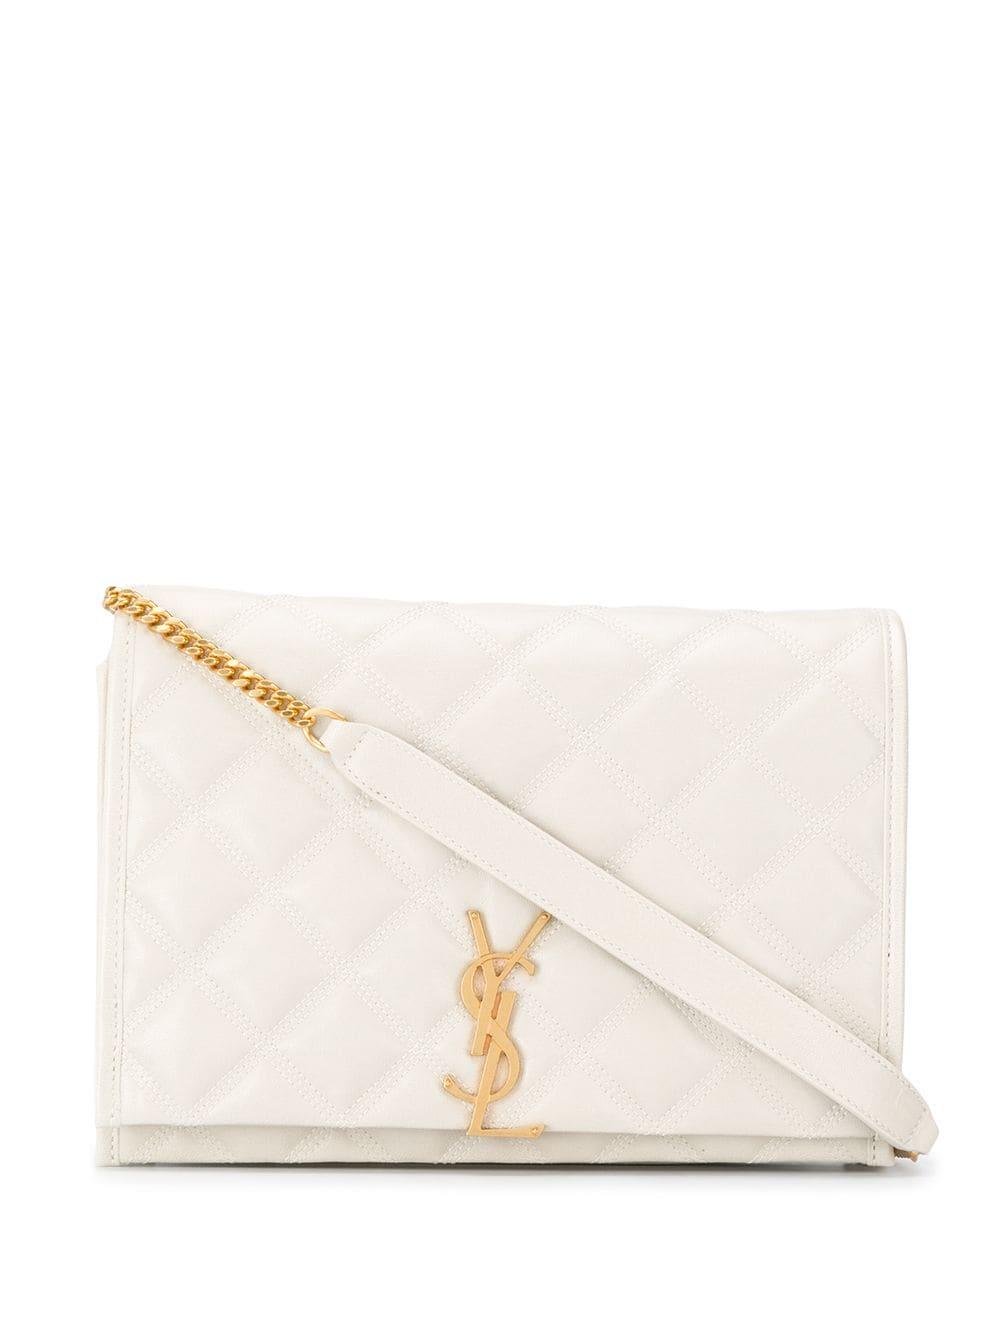 Monogram Leather Handbag